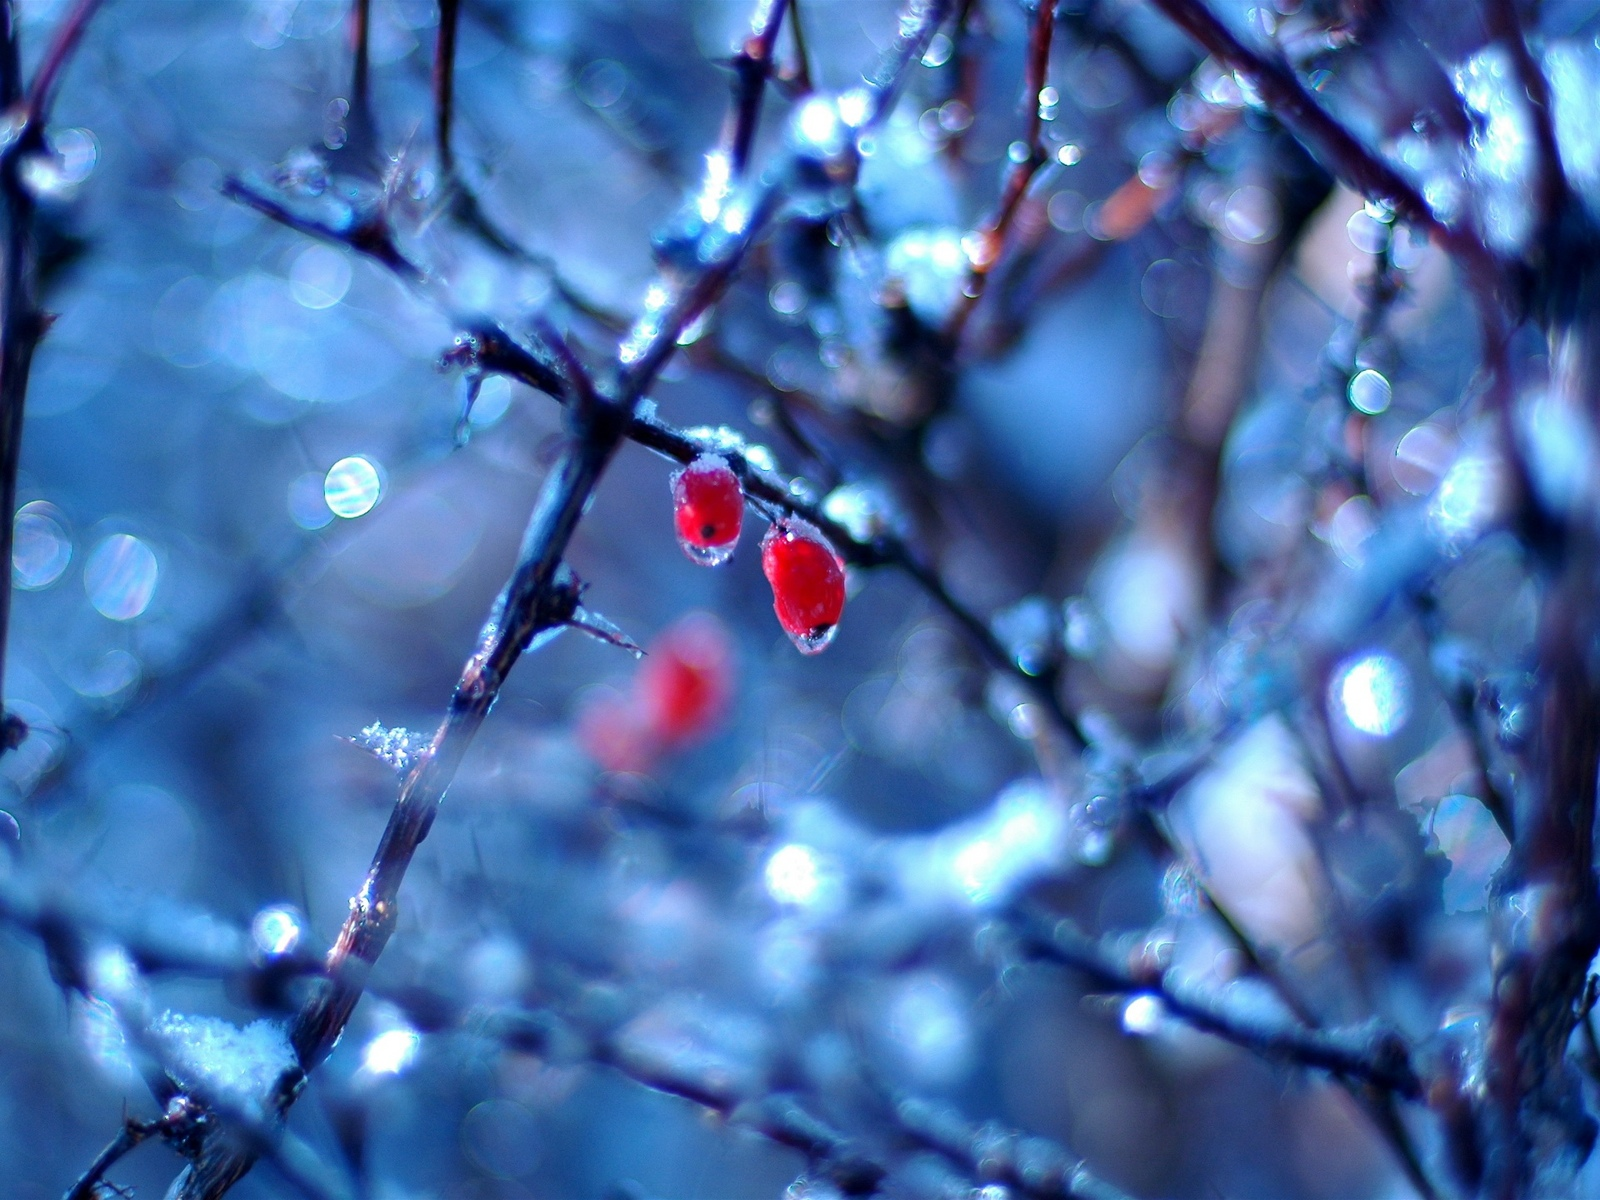 google winter screensavers and wallpaper - photo #38